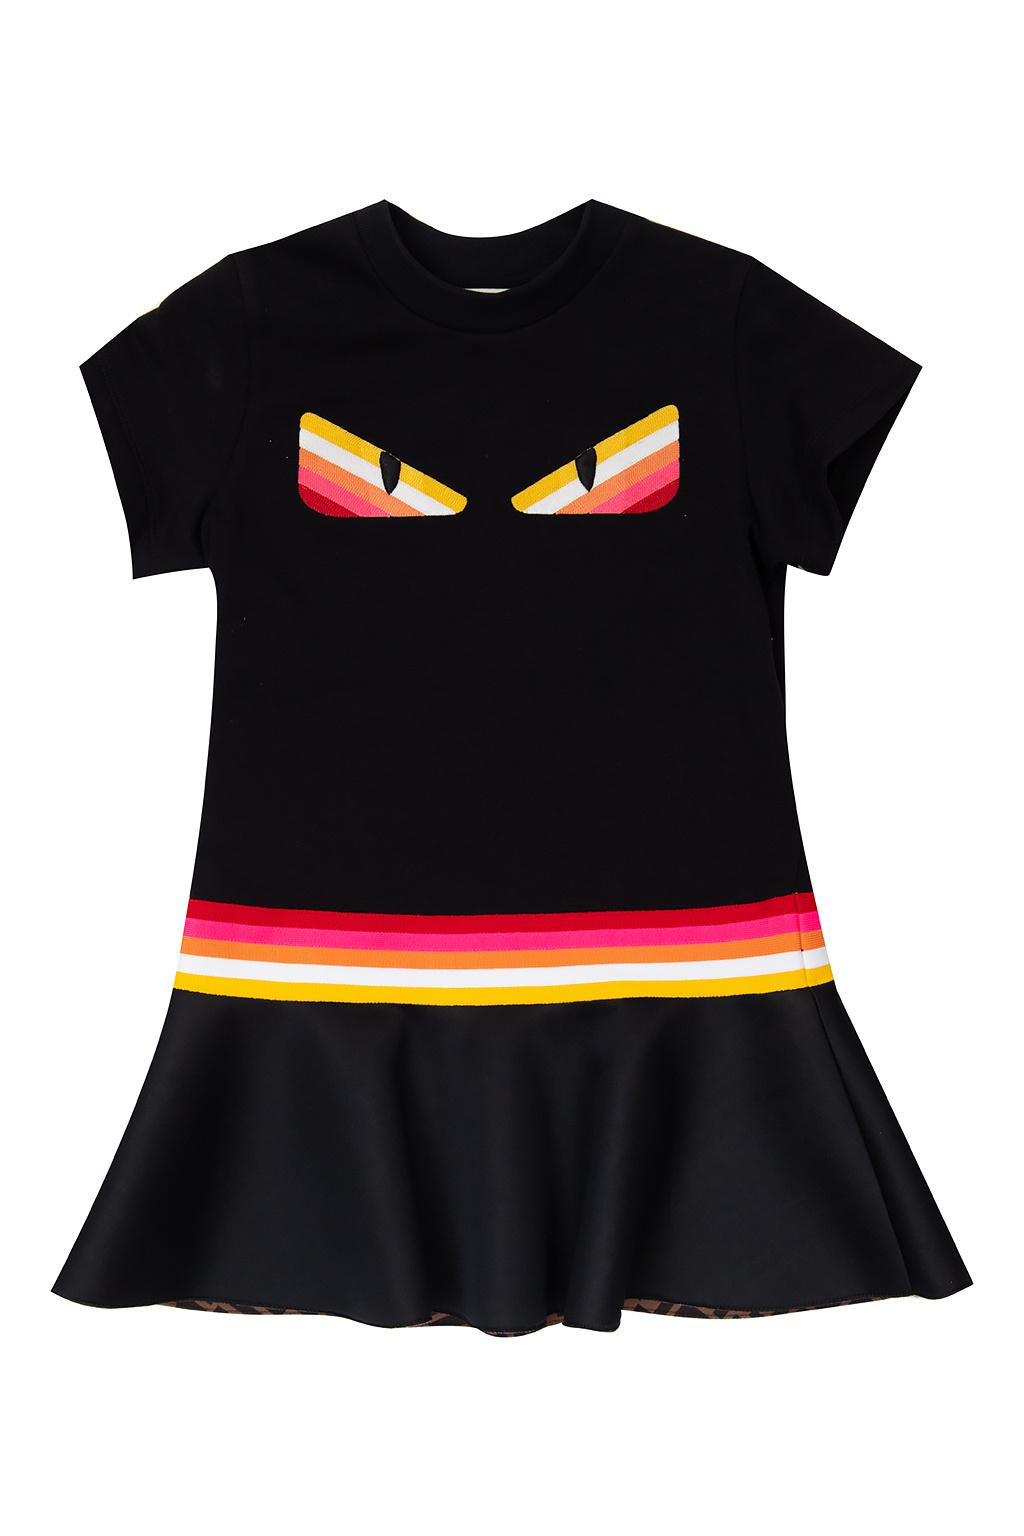 Fendi Kids Short sleeve dress